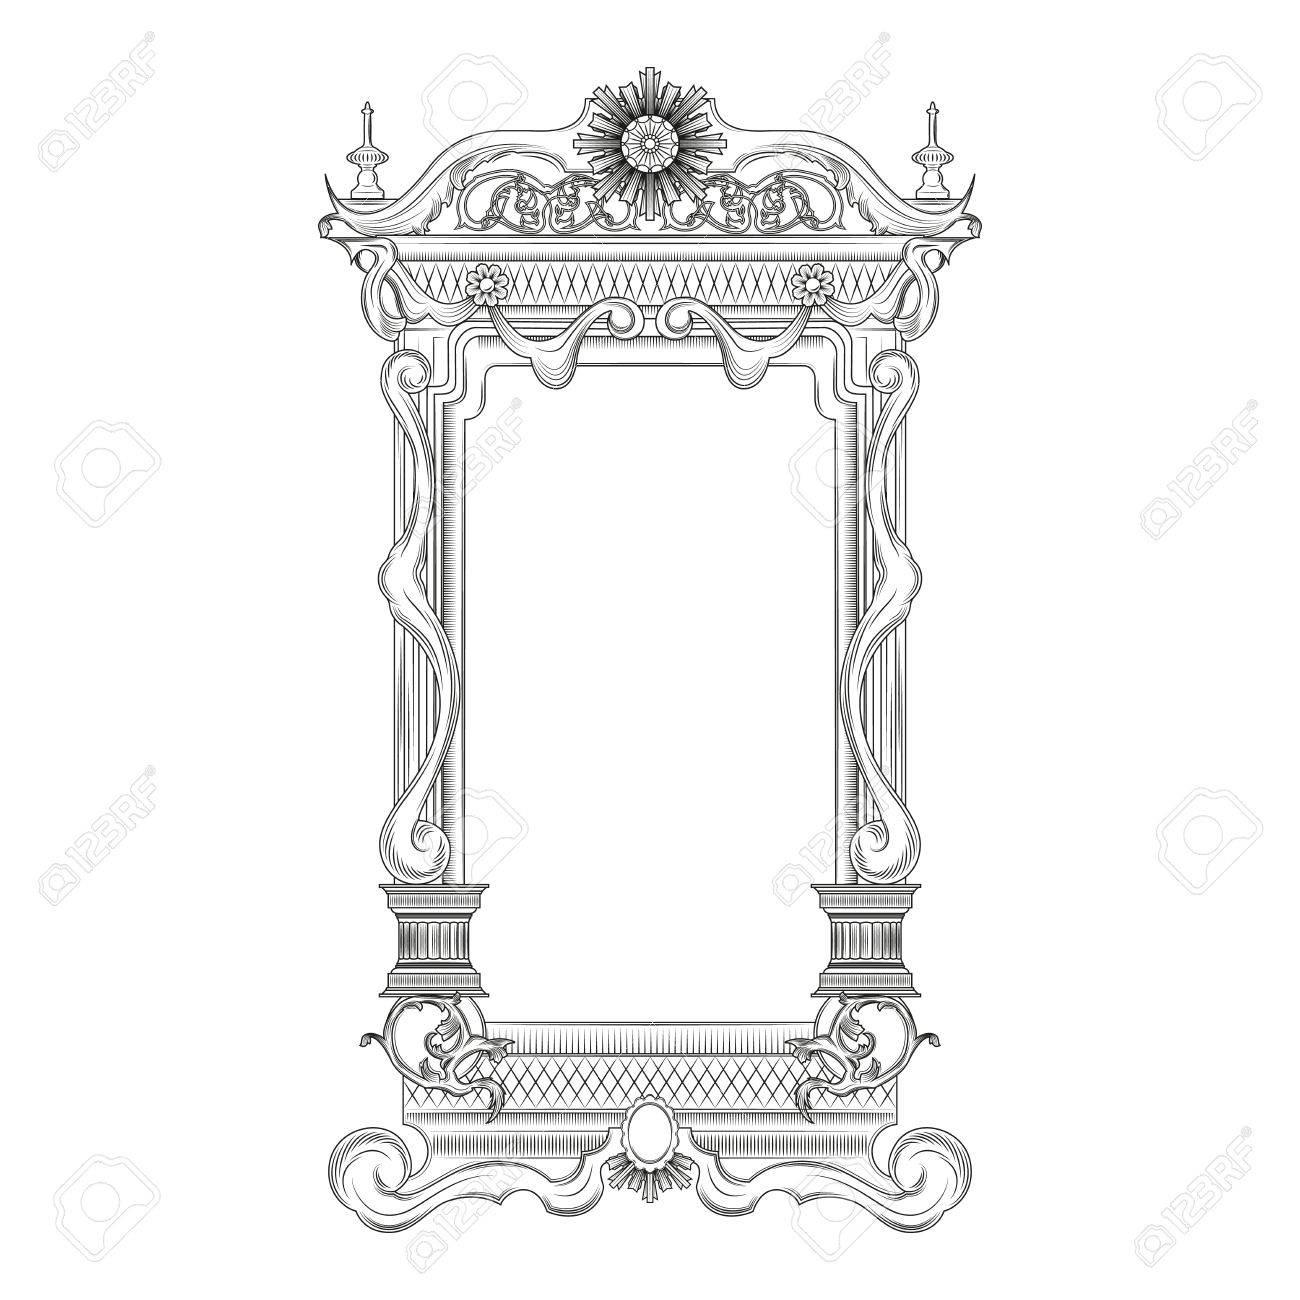 Vintage Baroque Style Mirror Frame Royalty Free Cliparts, Vectors Regarding Baroque Style Mirrors (View 22 of 25)